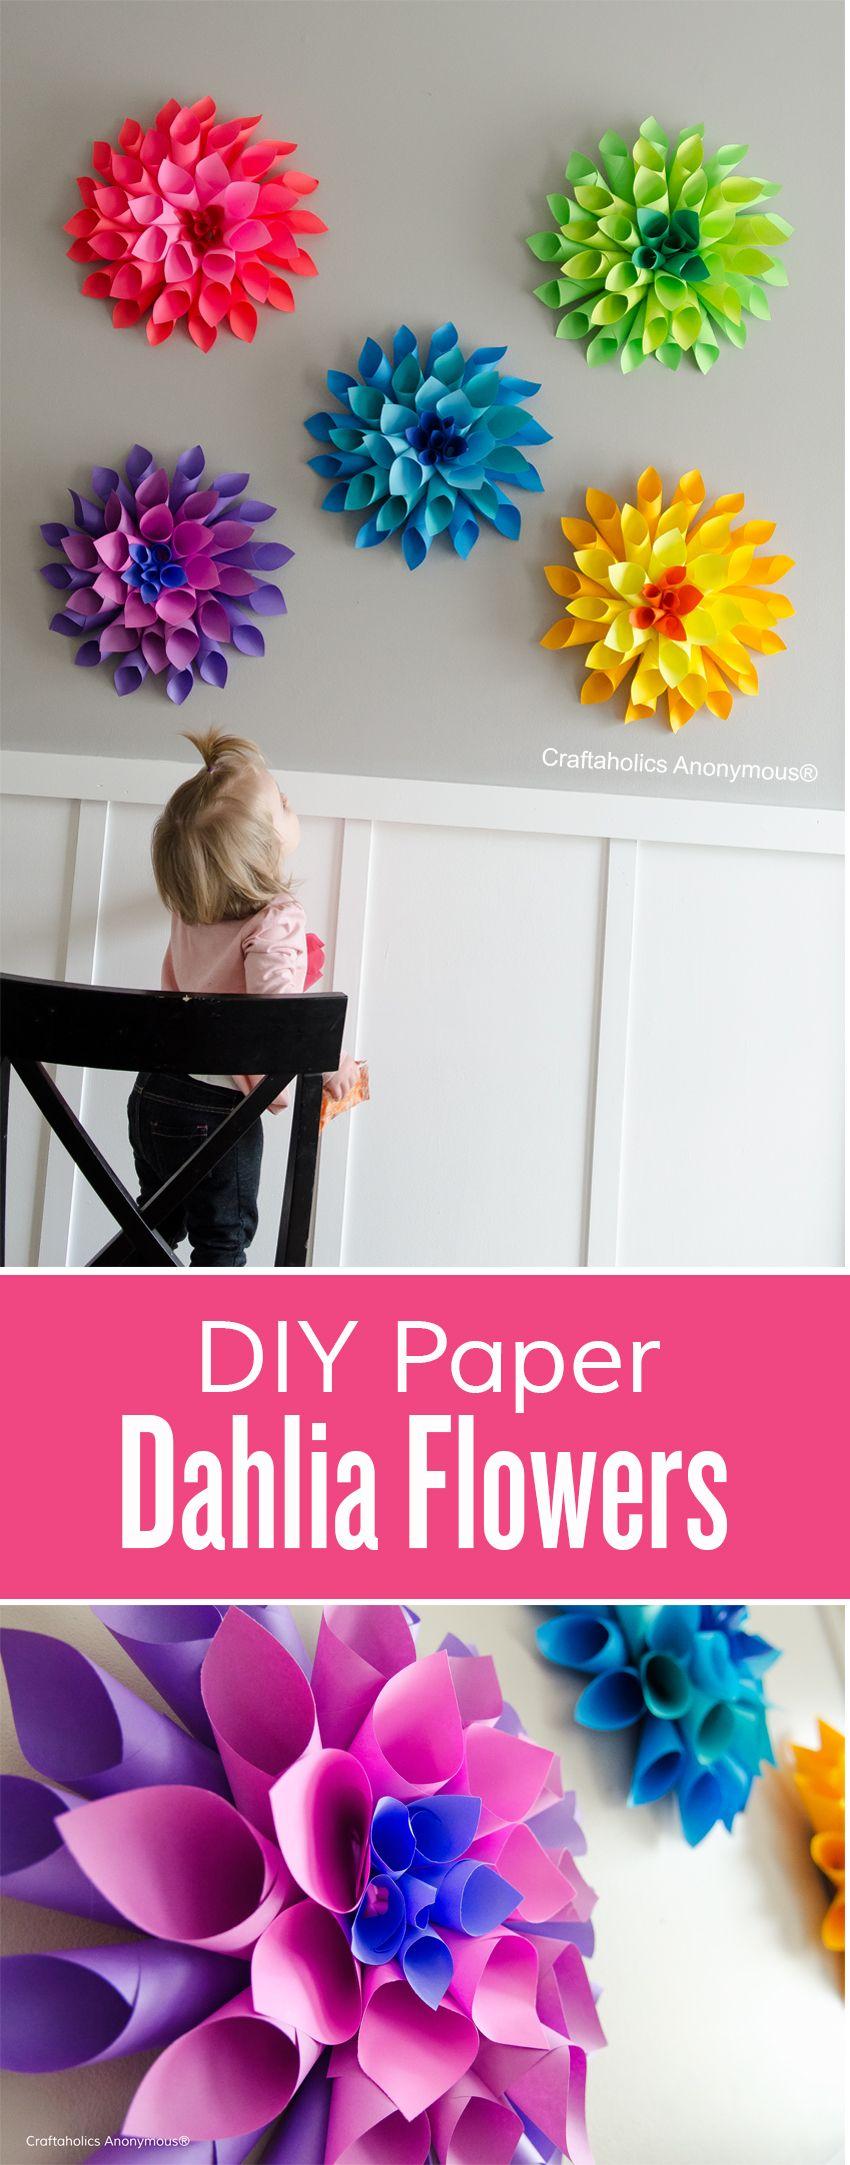 Rainbow Paper Dahlia Flowers Crafts Pinterest Crafts Paper